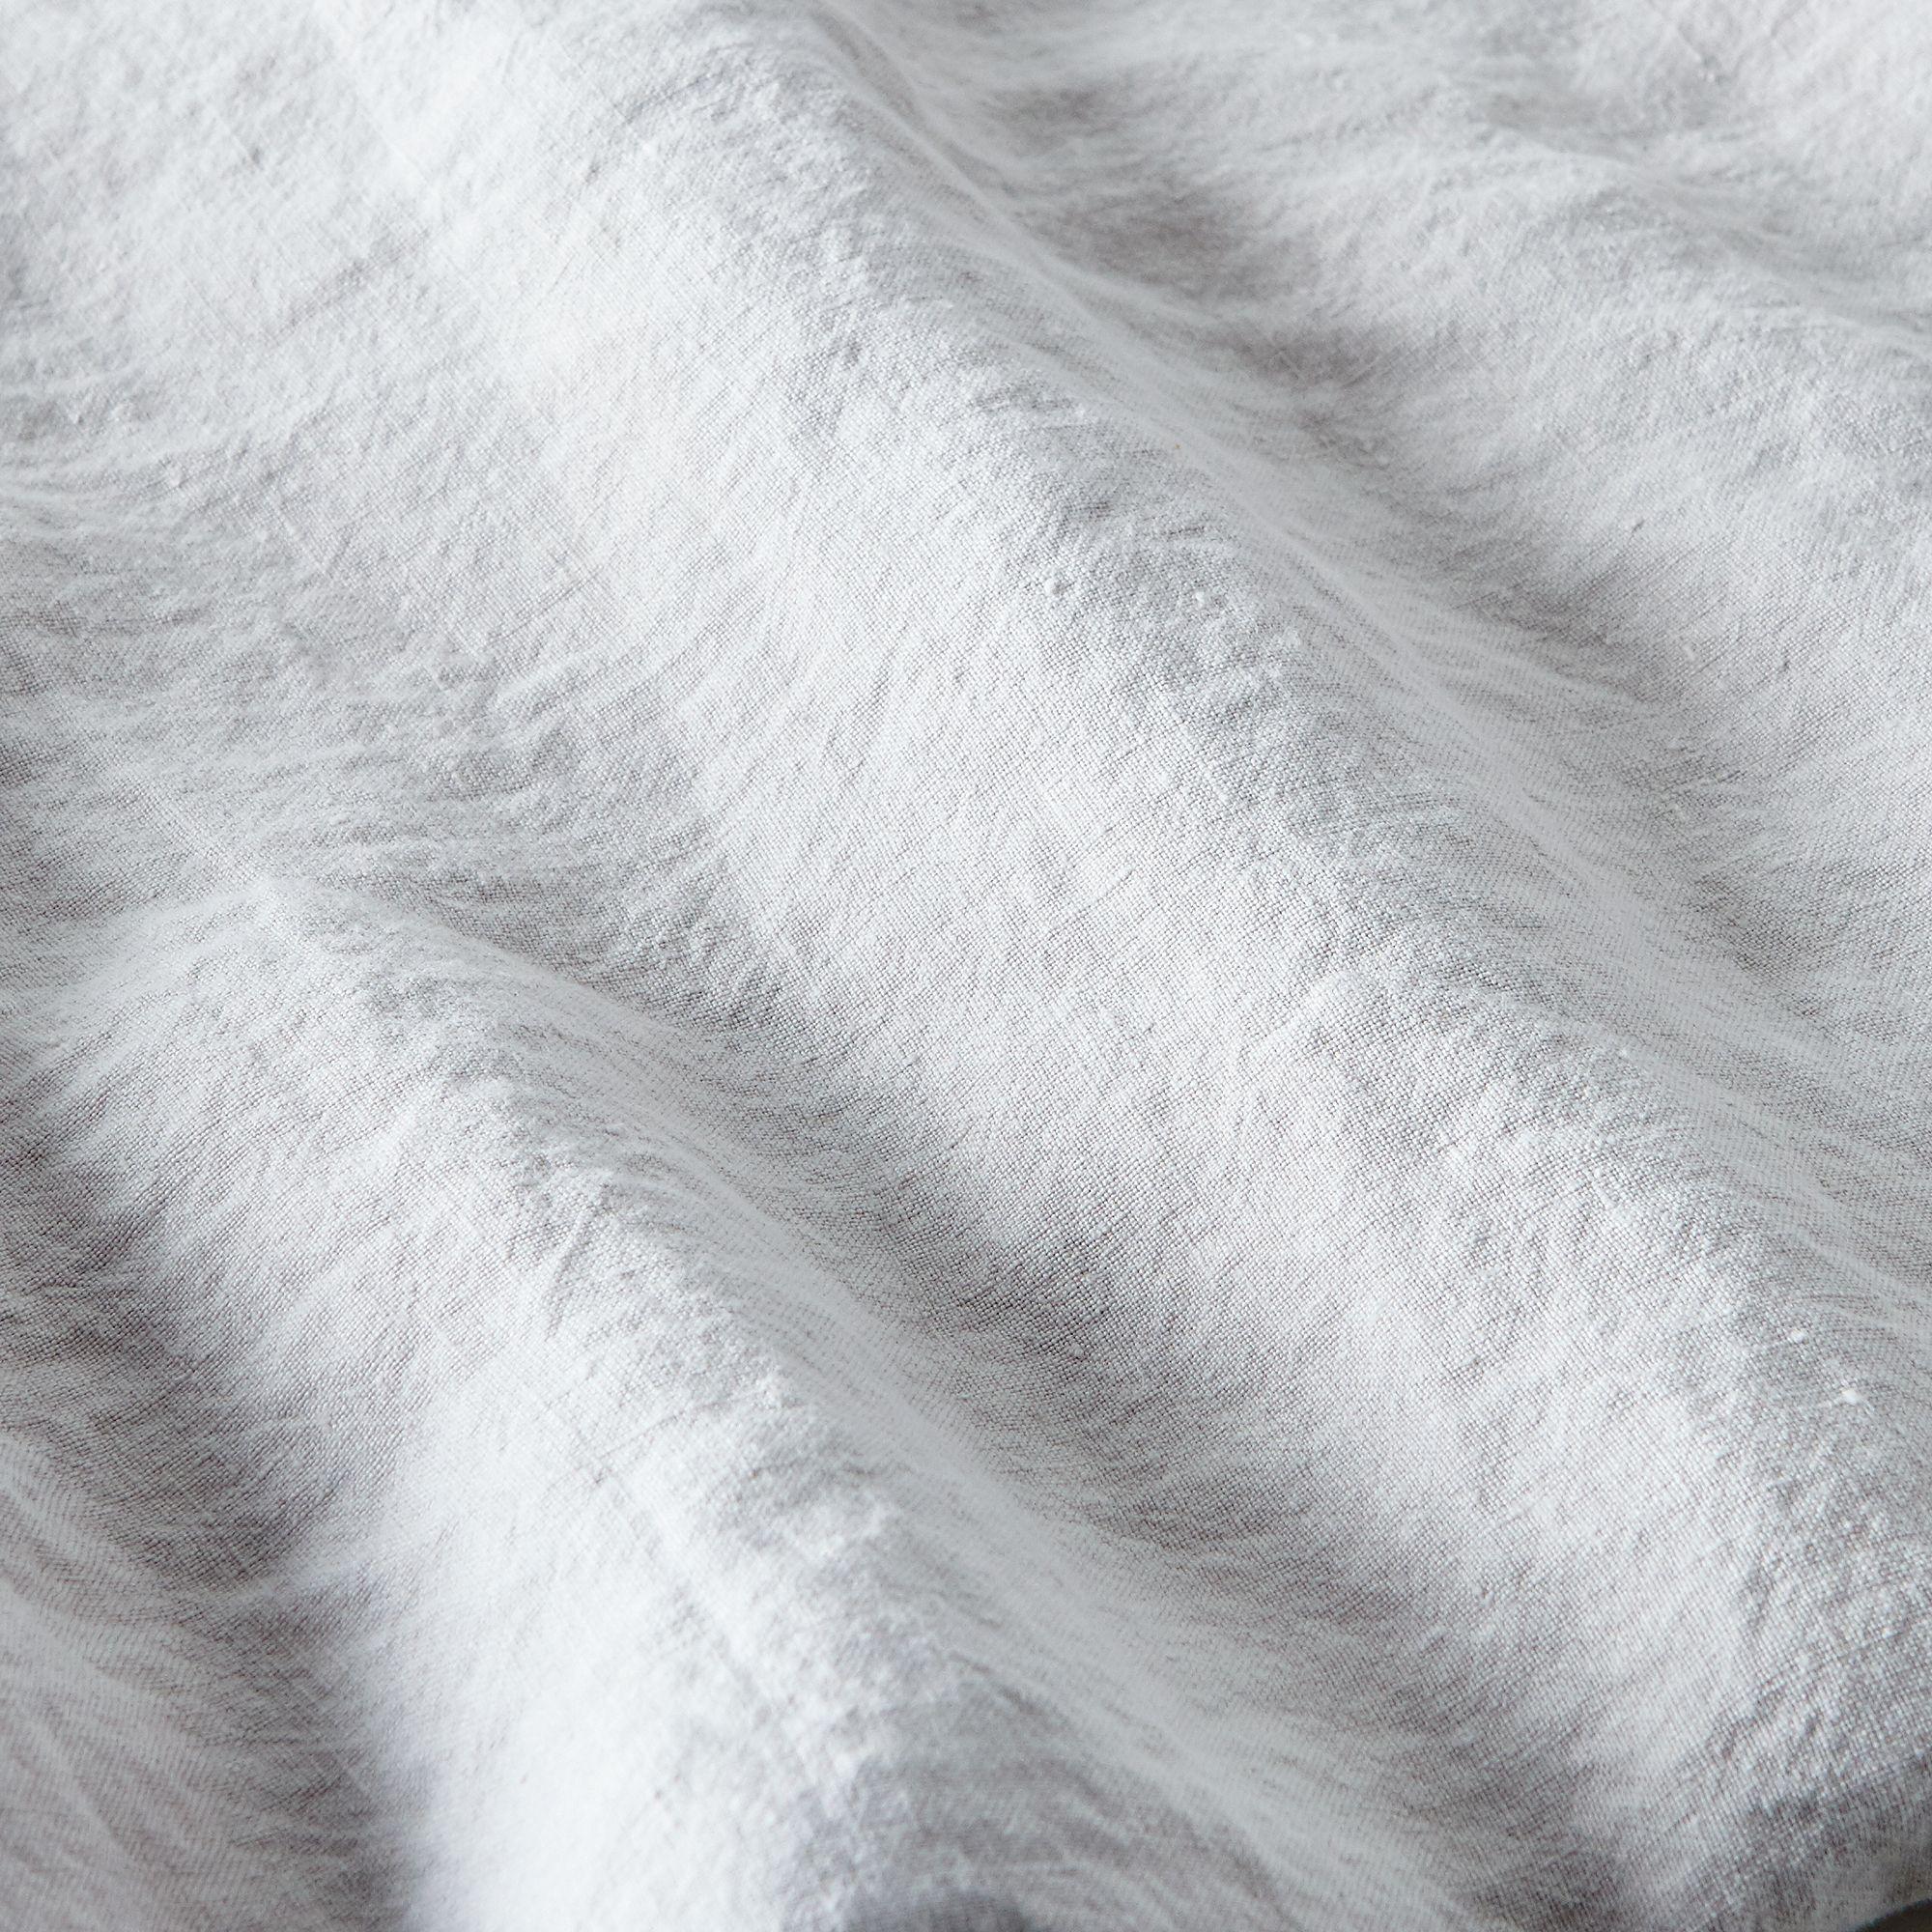 Bedding by Phoebe Matthews